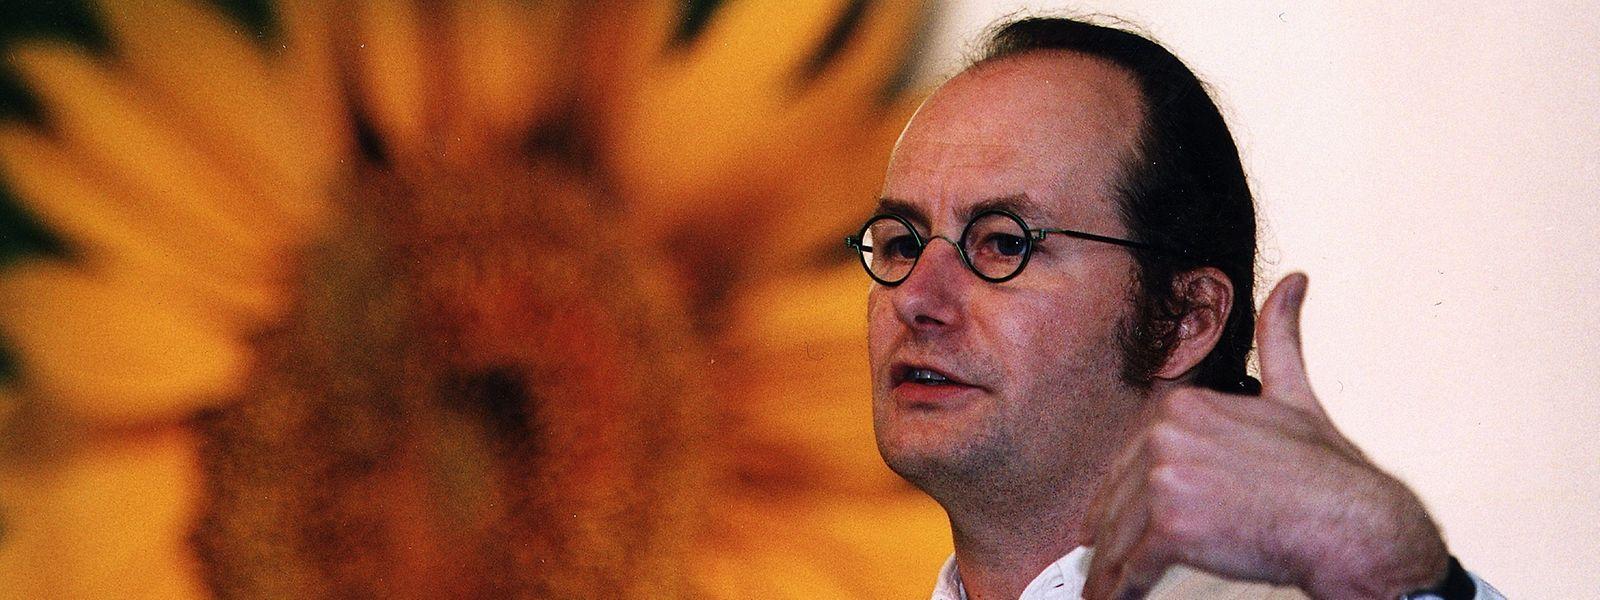 1999 zieht Claude Turmes zum ersten Mal ins Europaparlament ein.